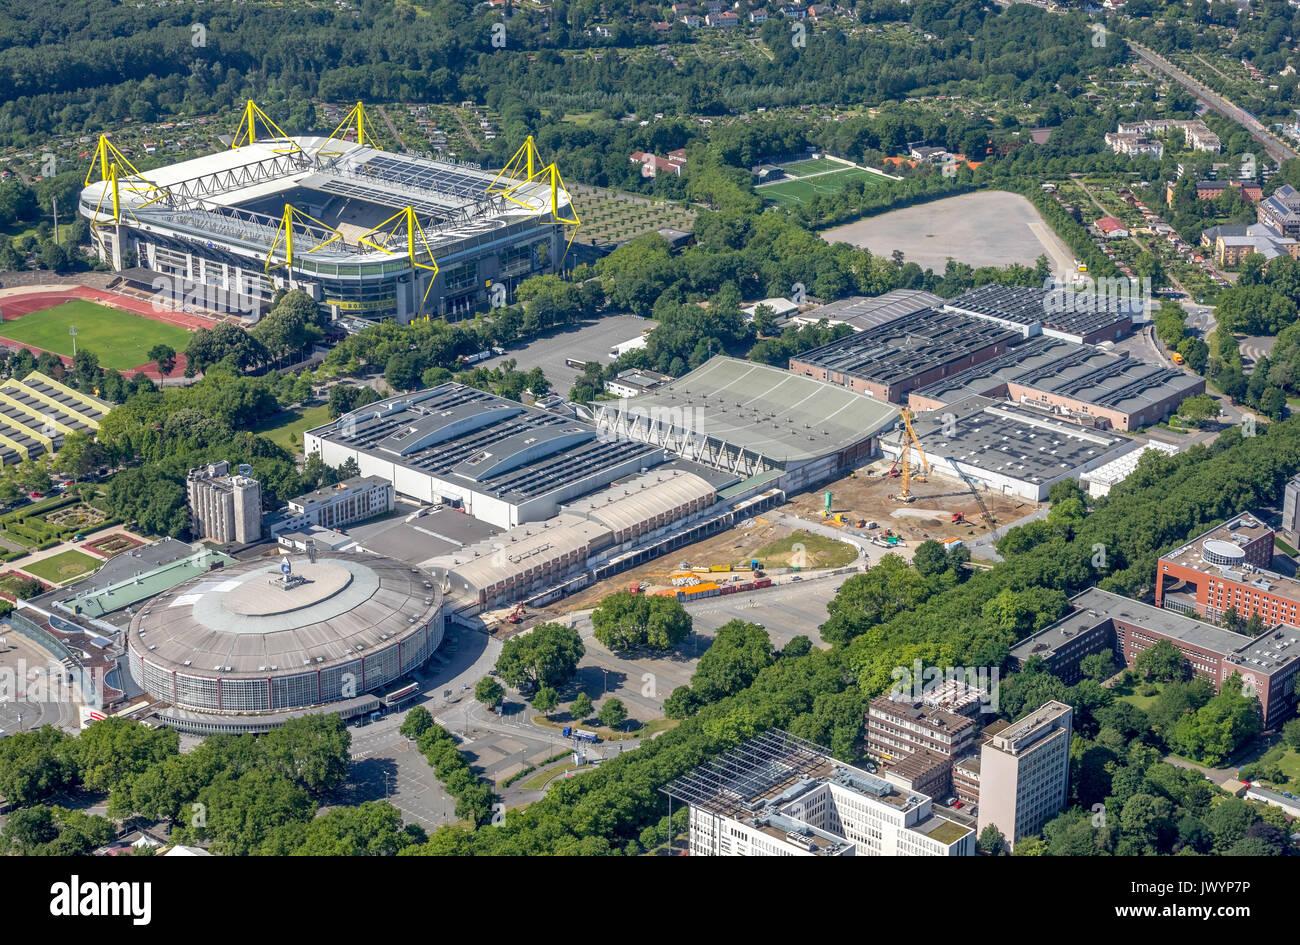 Fair Westfalenhallen Dortmund - entrance Messe West, reconstruction, near westfalenstadion, SignalIdunaPark, Westfalenhalle, Dortmund, Ruhr area, Nort - Stock Image